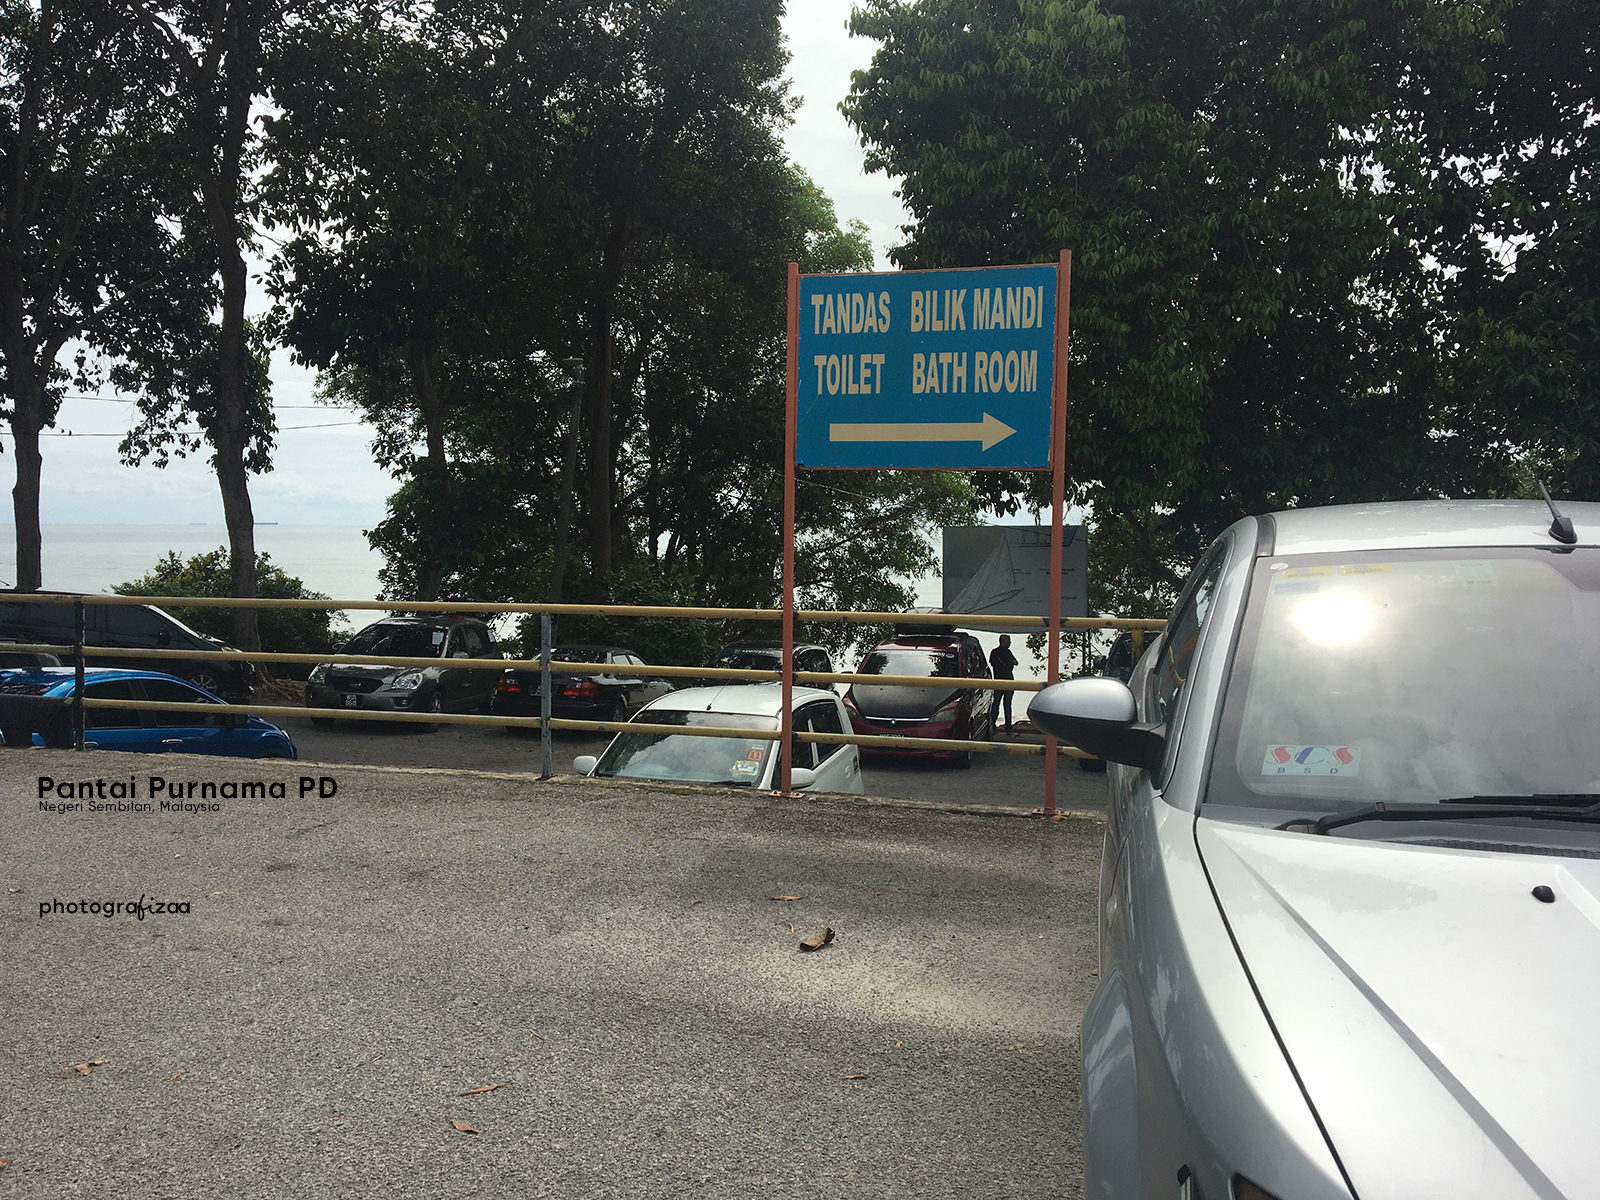 Ruang Parkir Pantai Purnama Port Dickson